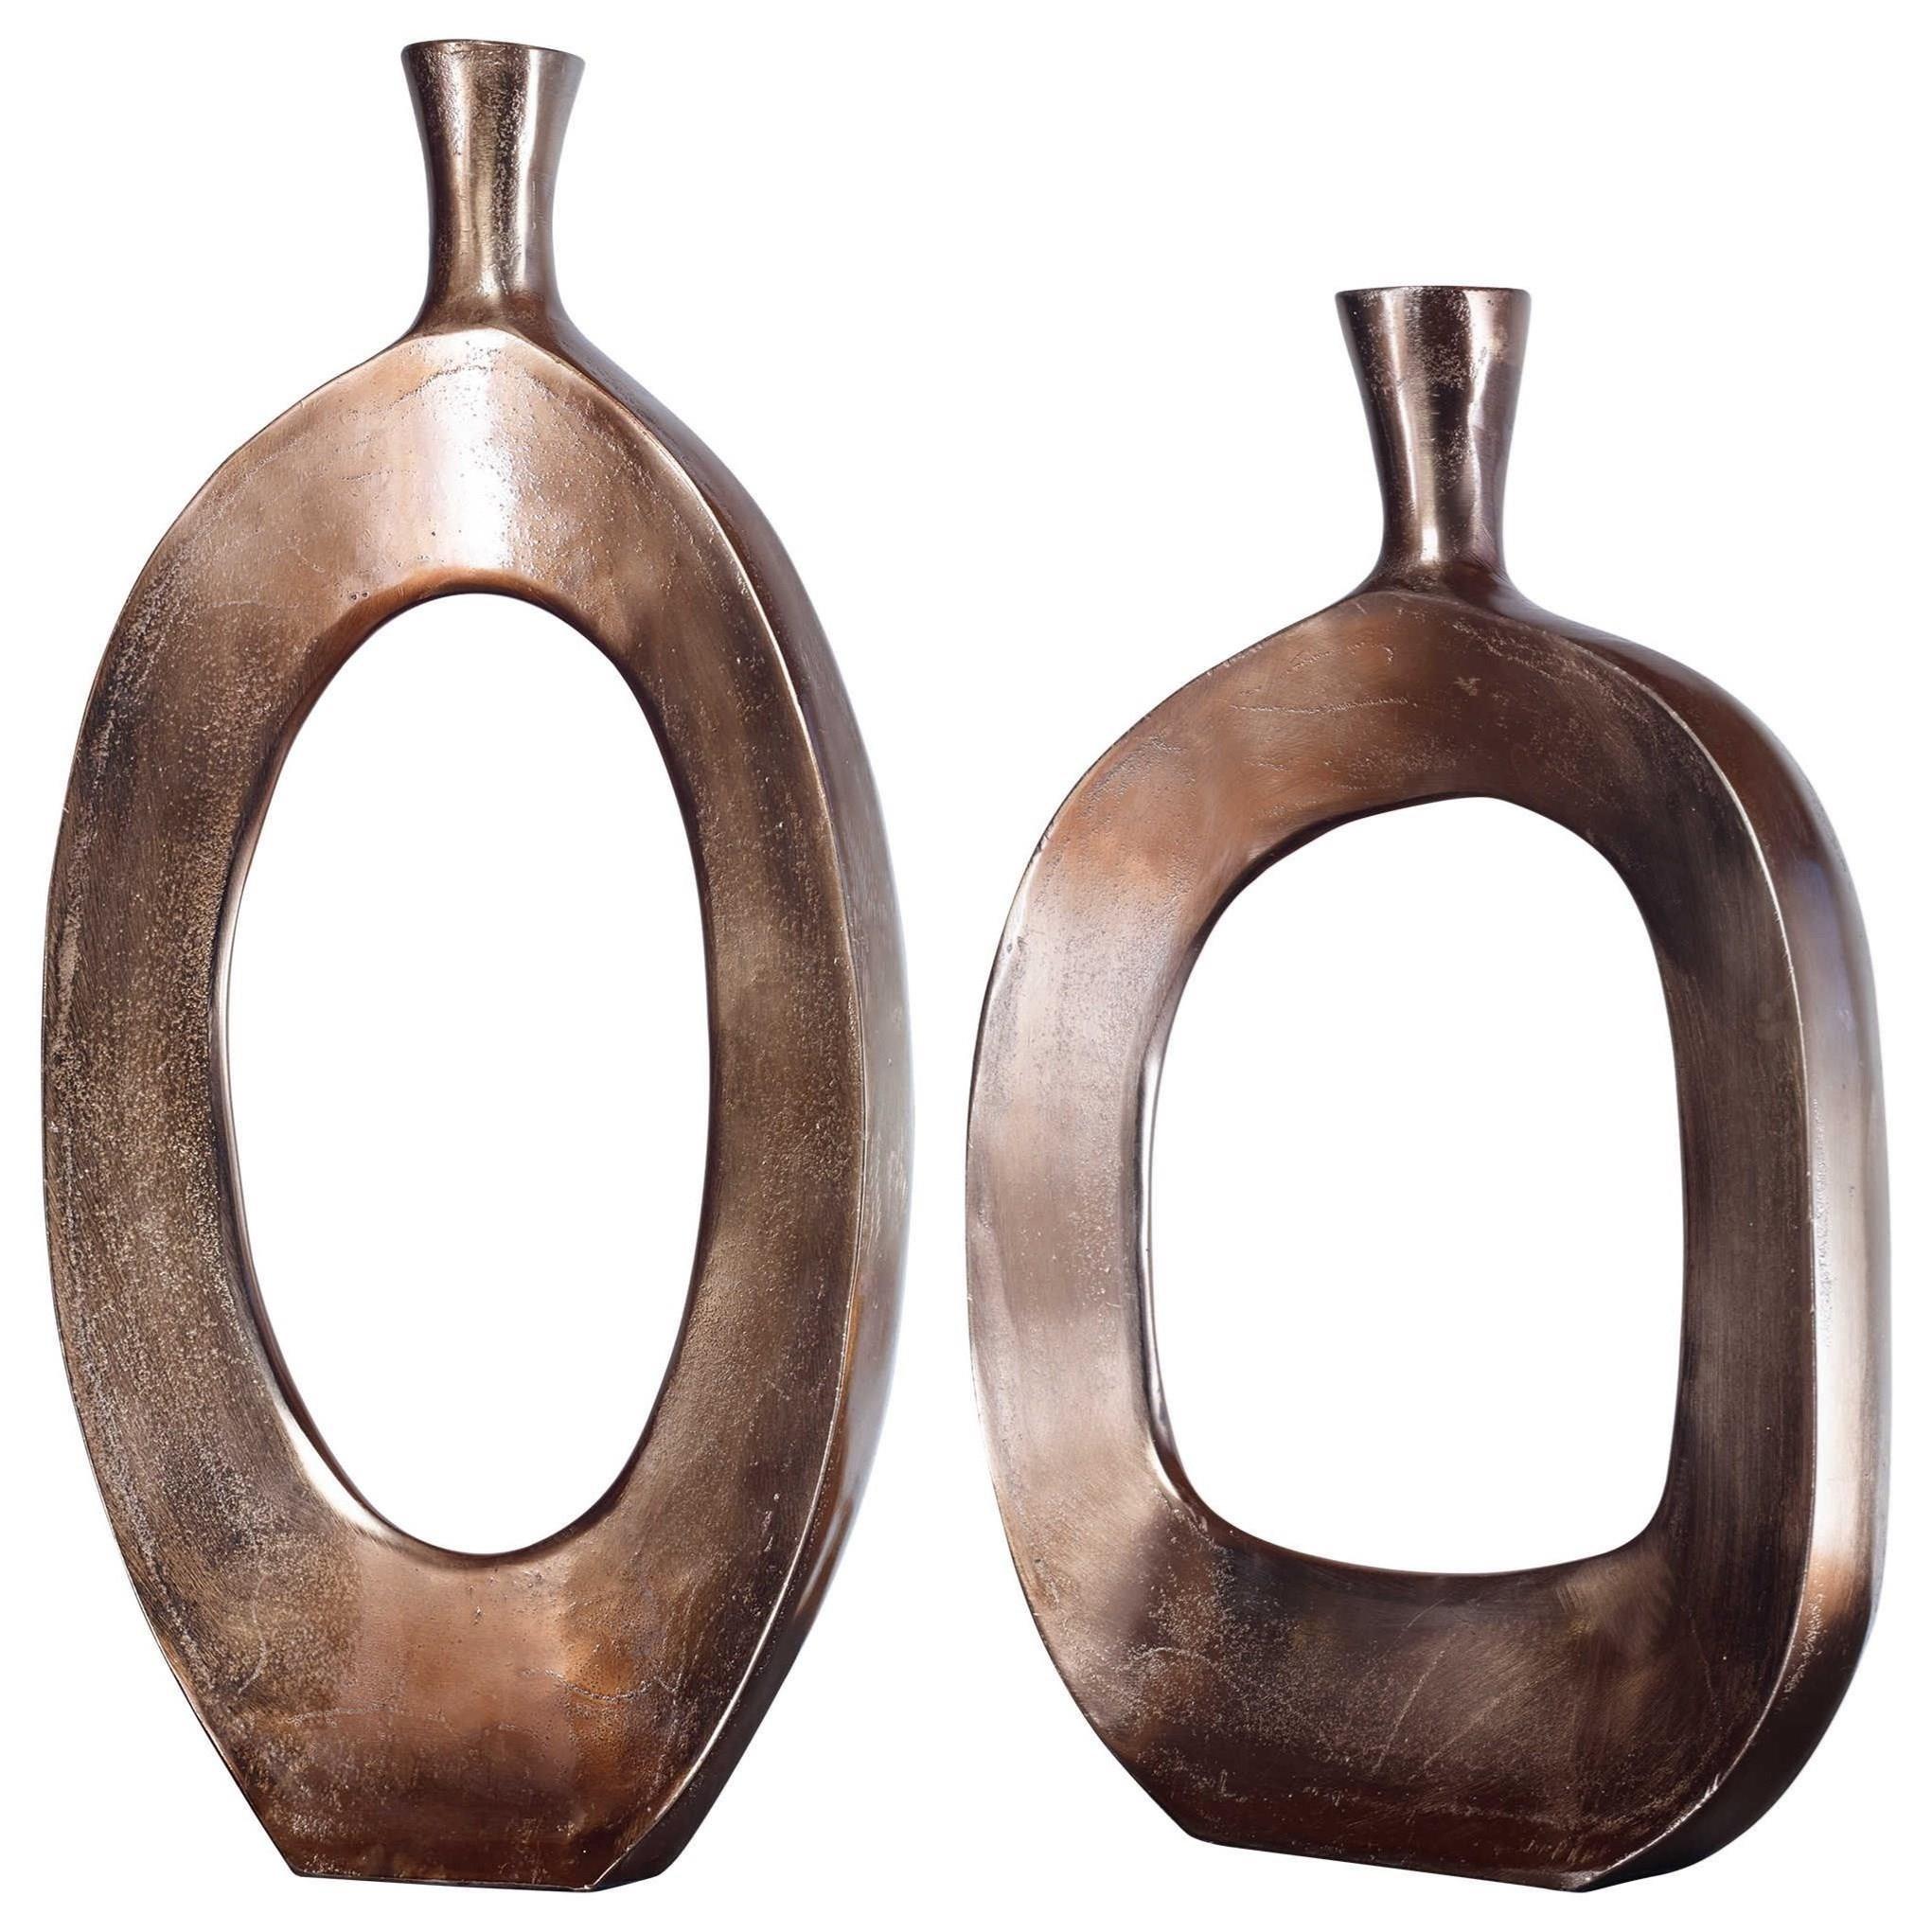 Accessories - Vases and Urns Kyler Textured Bronze Vases Set/2 by Uttermost at Mueller Furniture